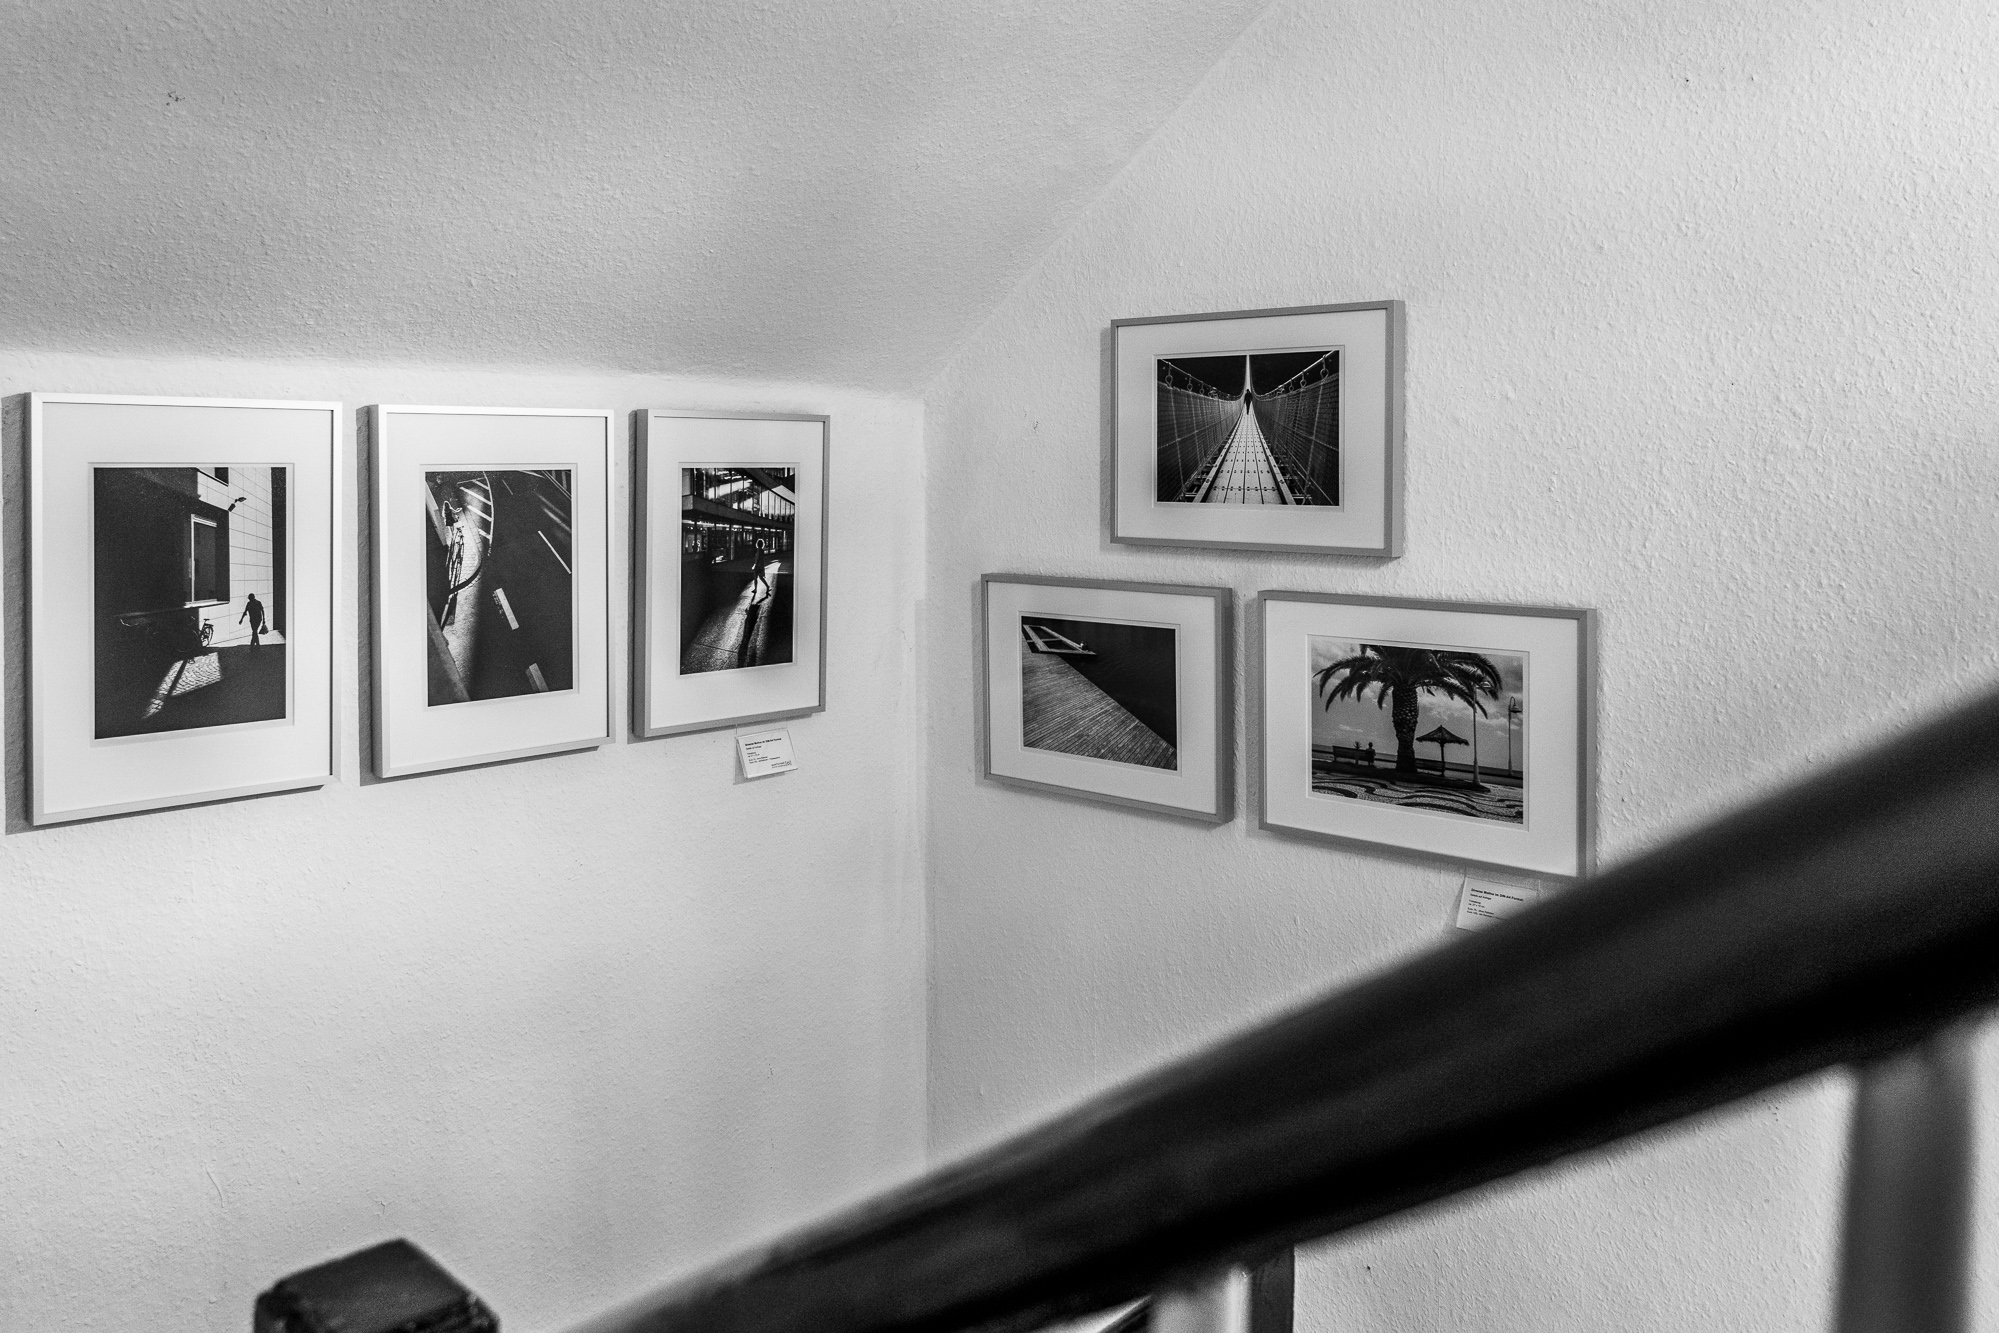 querformat-fotografie - Achim Katzberg - Diverse Motive im Format 60 x 40 - querformat-fotografie_Fototreppe_42-001